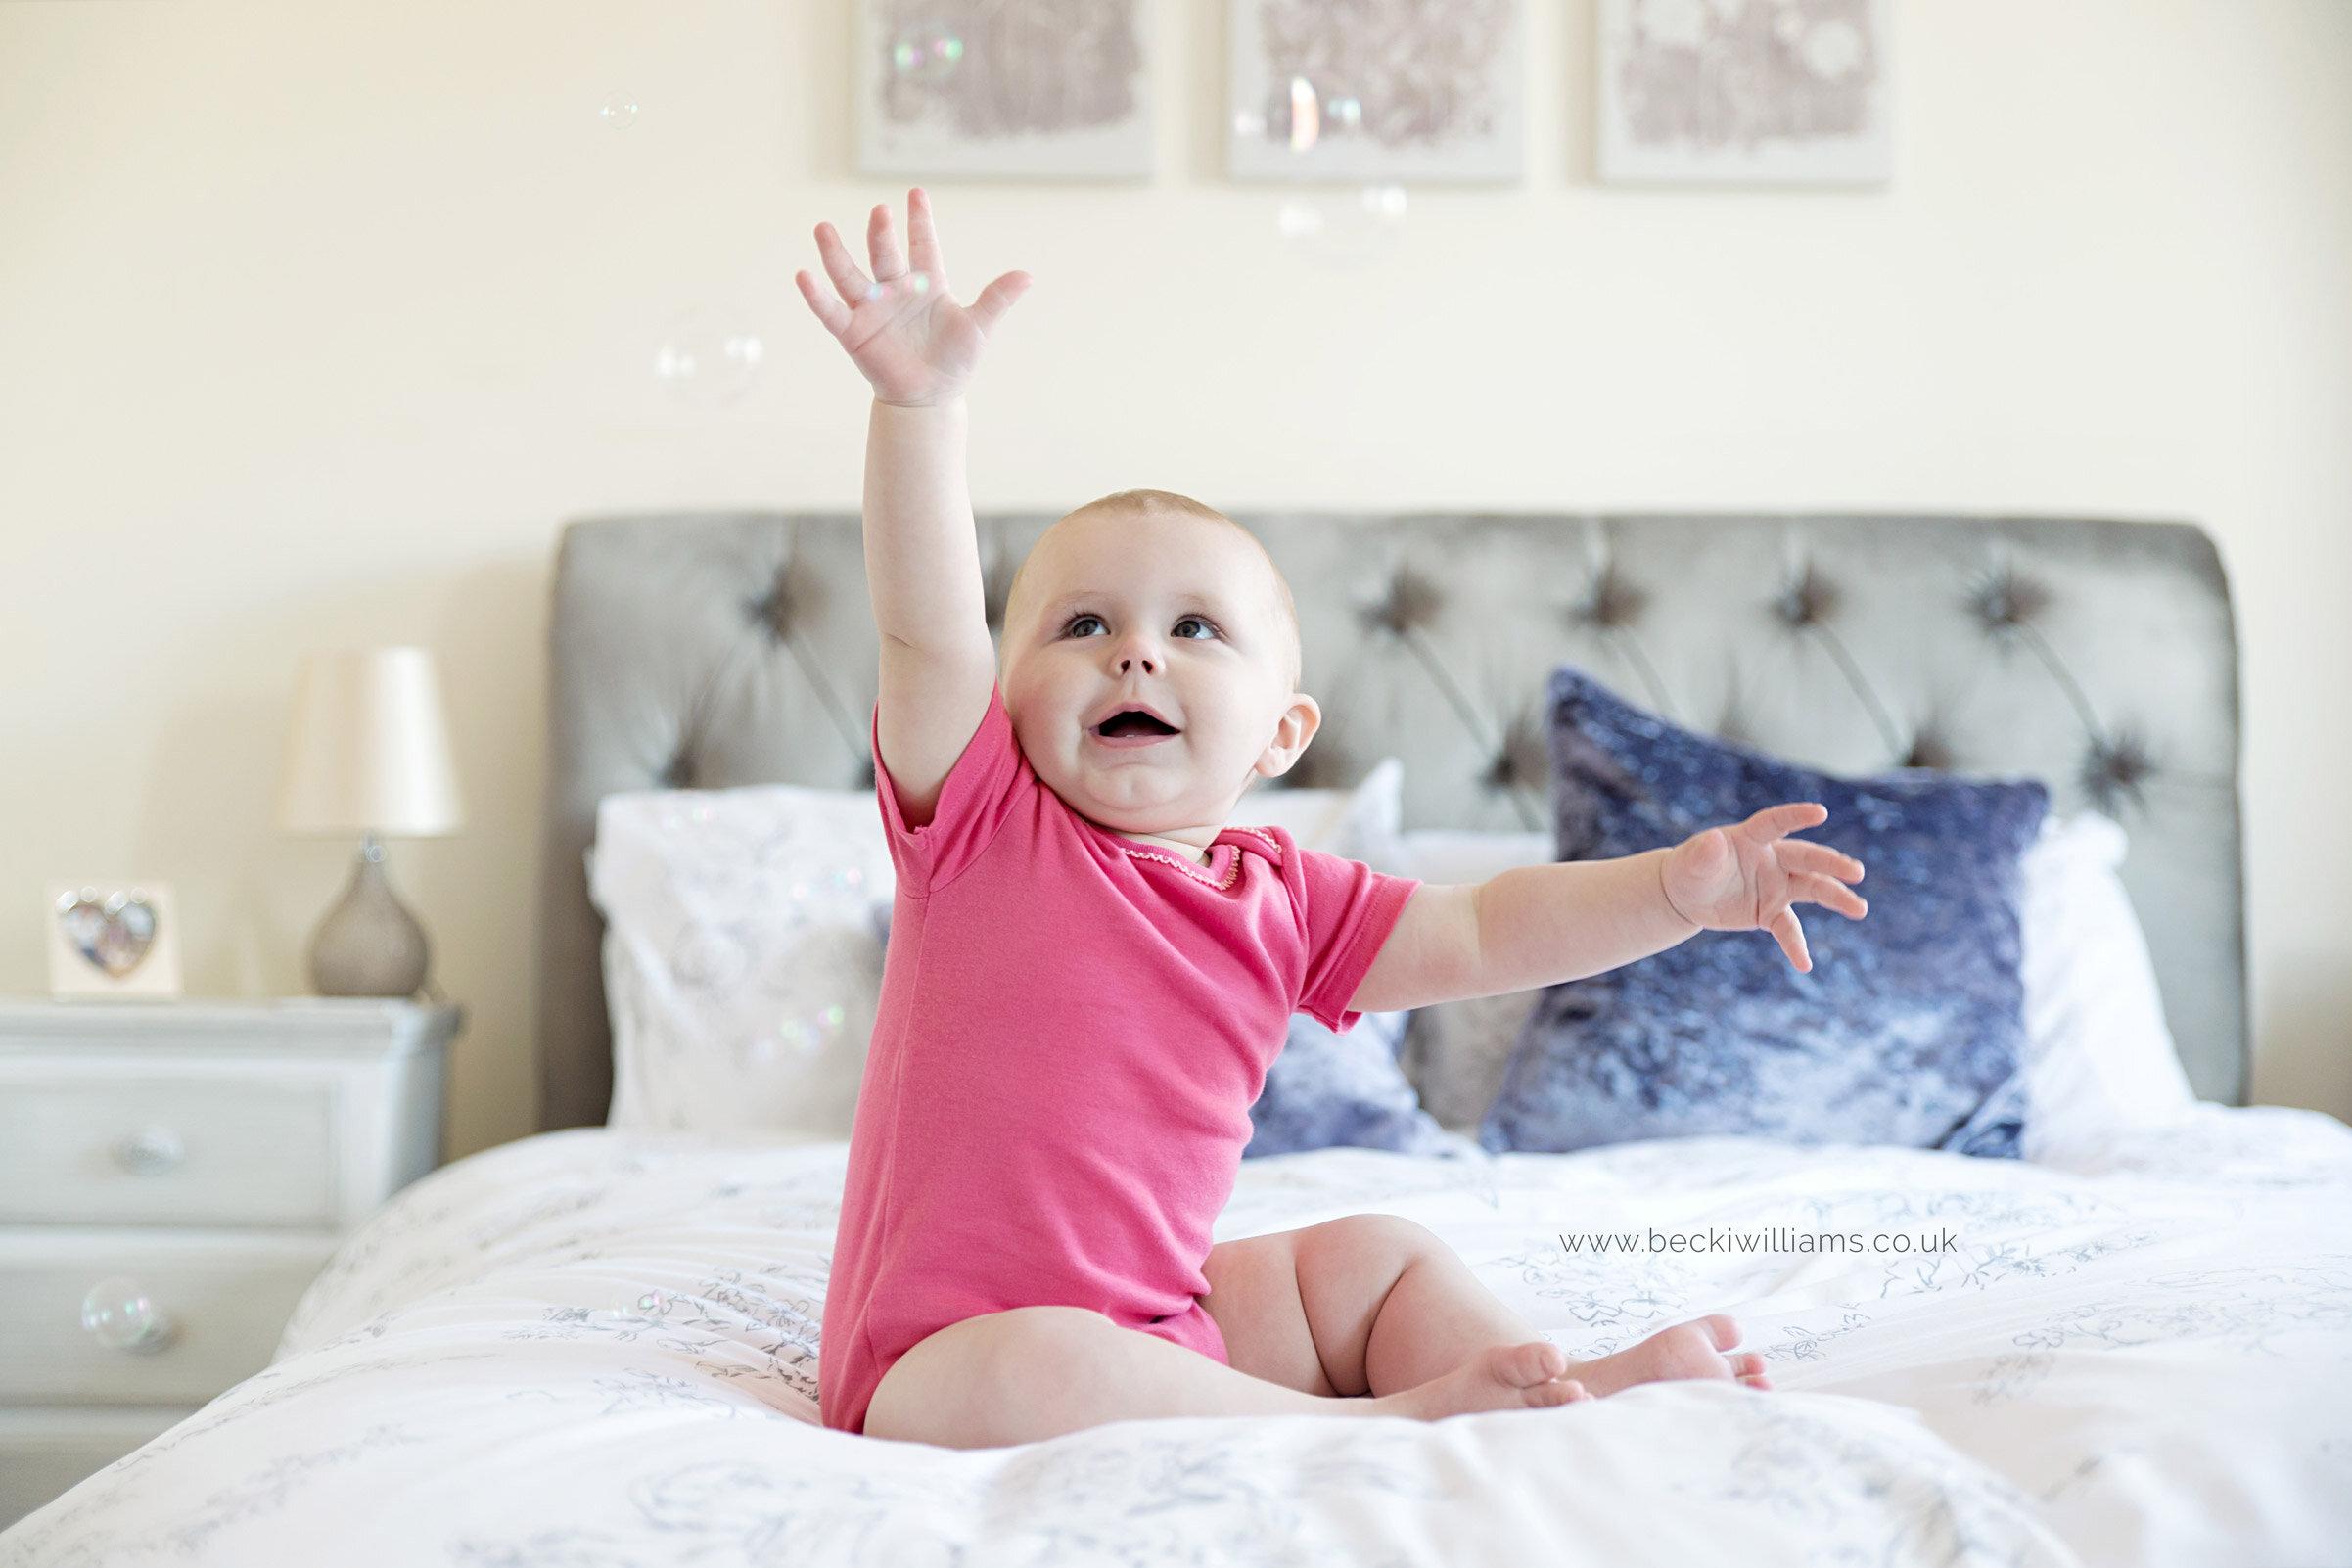 lifestyle-baby-photography-in-your-home-hemel-hempstead-bubbles-fun.jpg